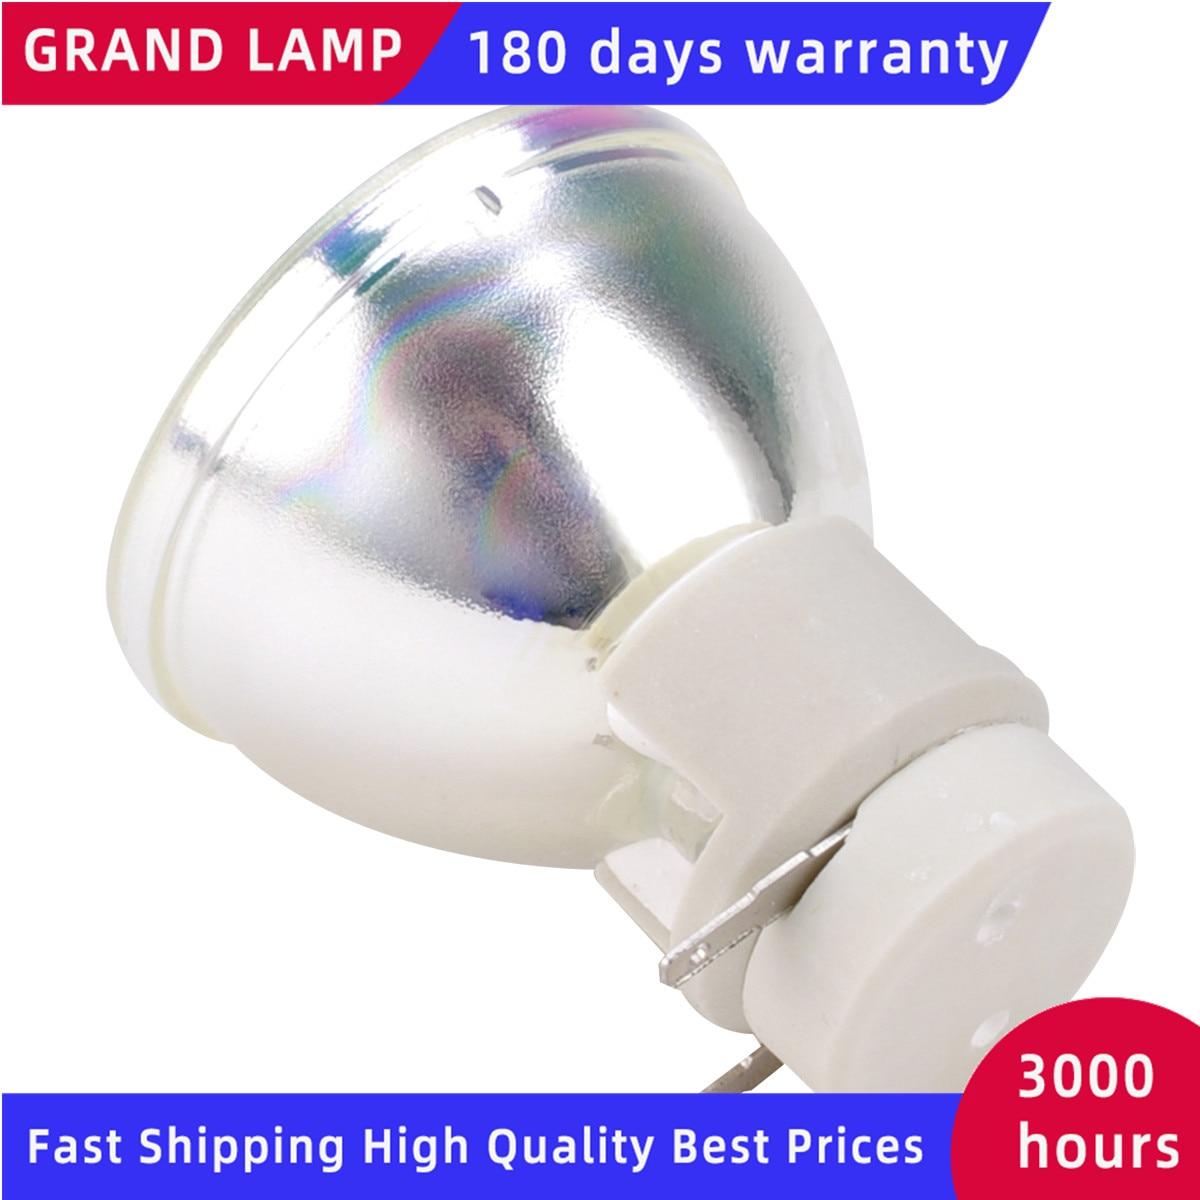 Совместимая лампа 5811100784-S, для проекторов Vivitek D925TX, D927TW, H1080, Promethean PRM25, 230 Вт